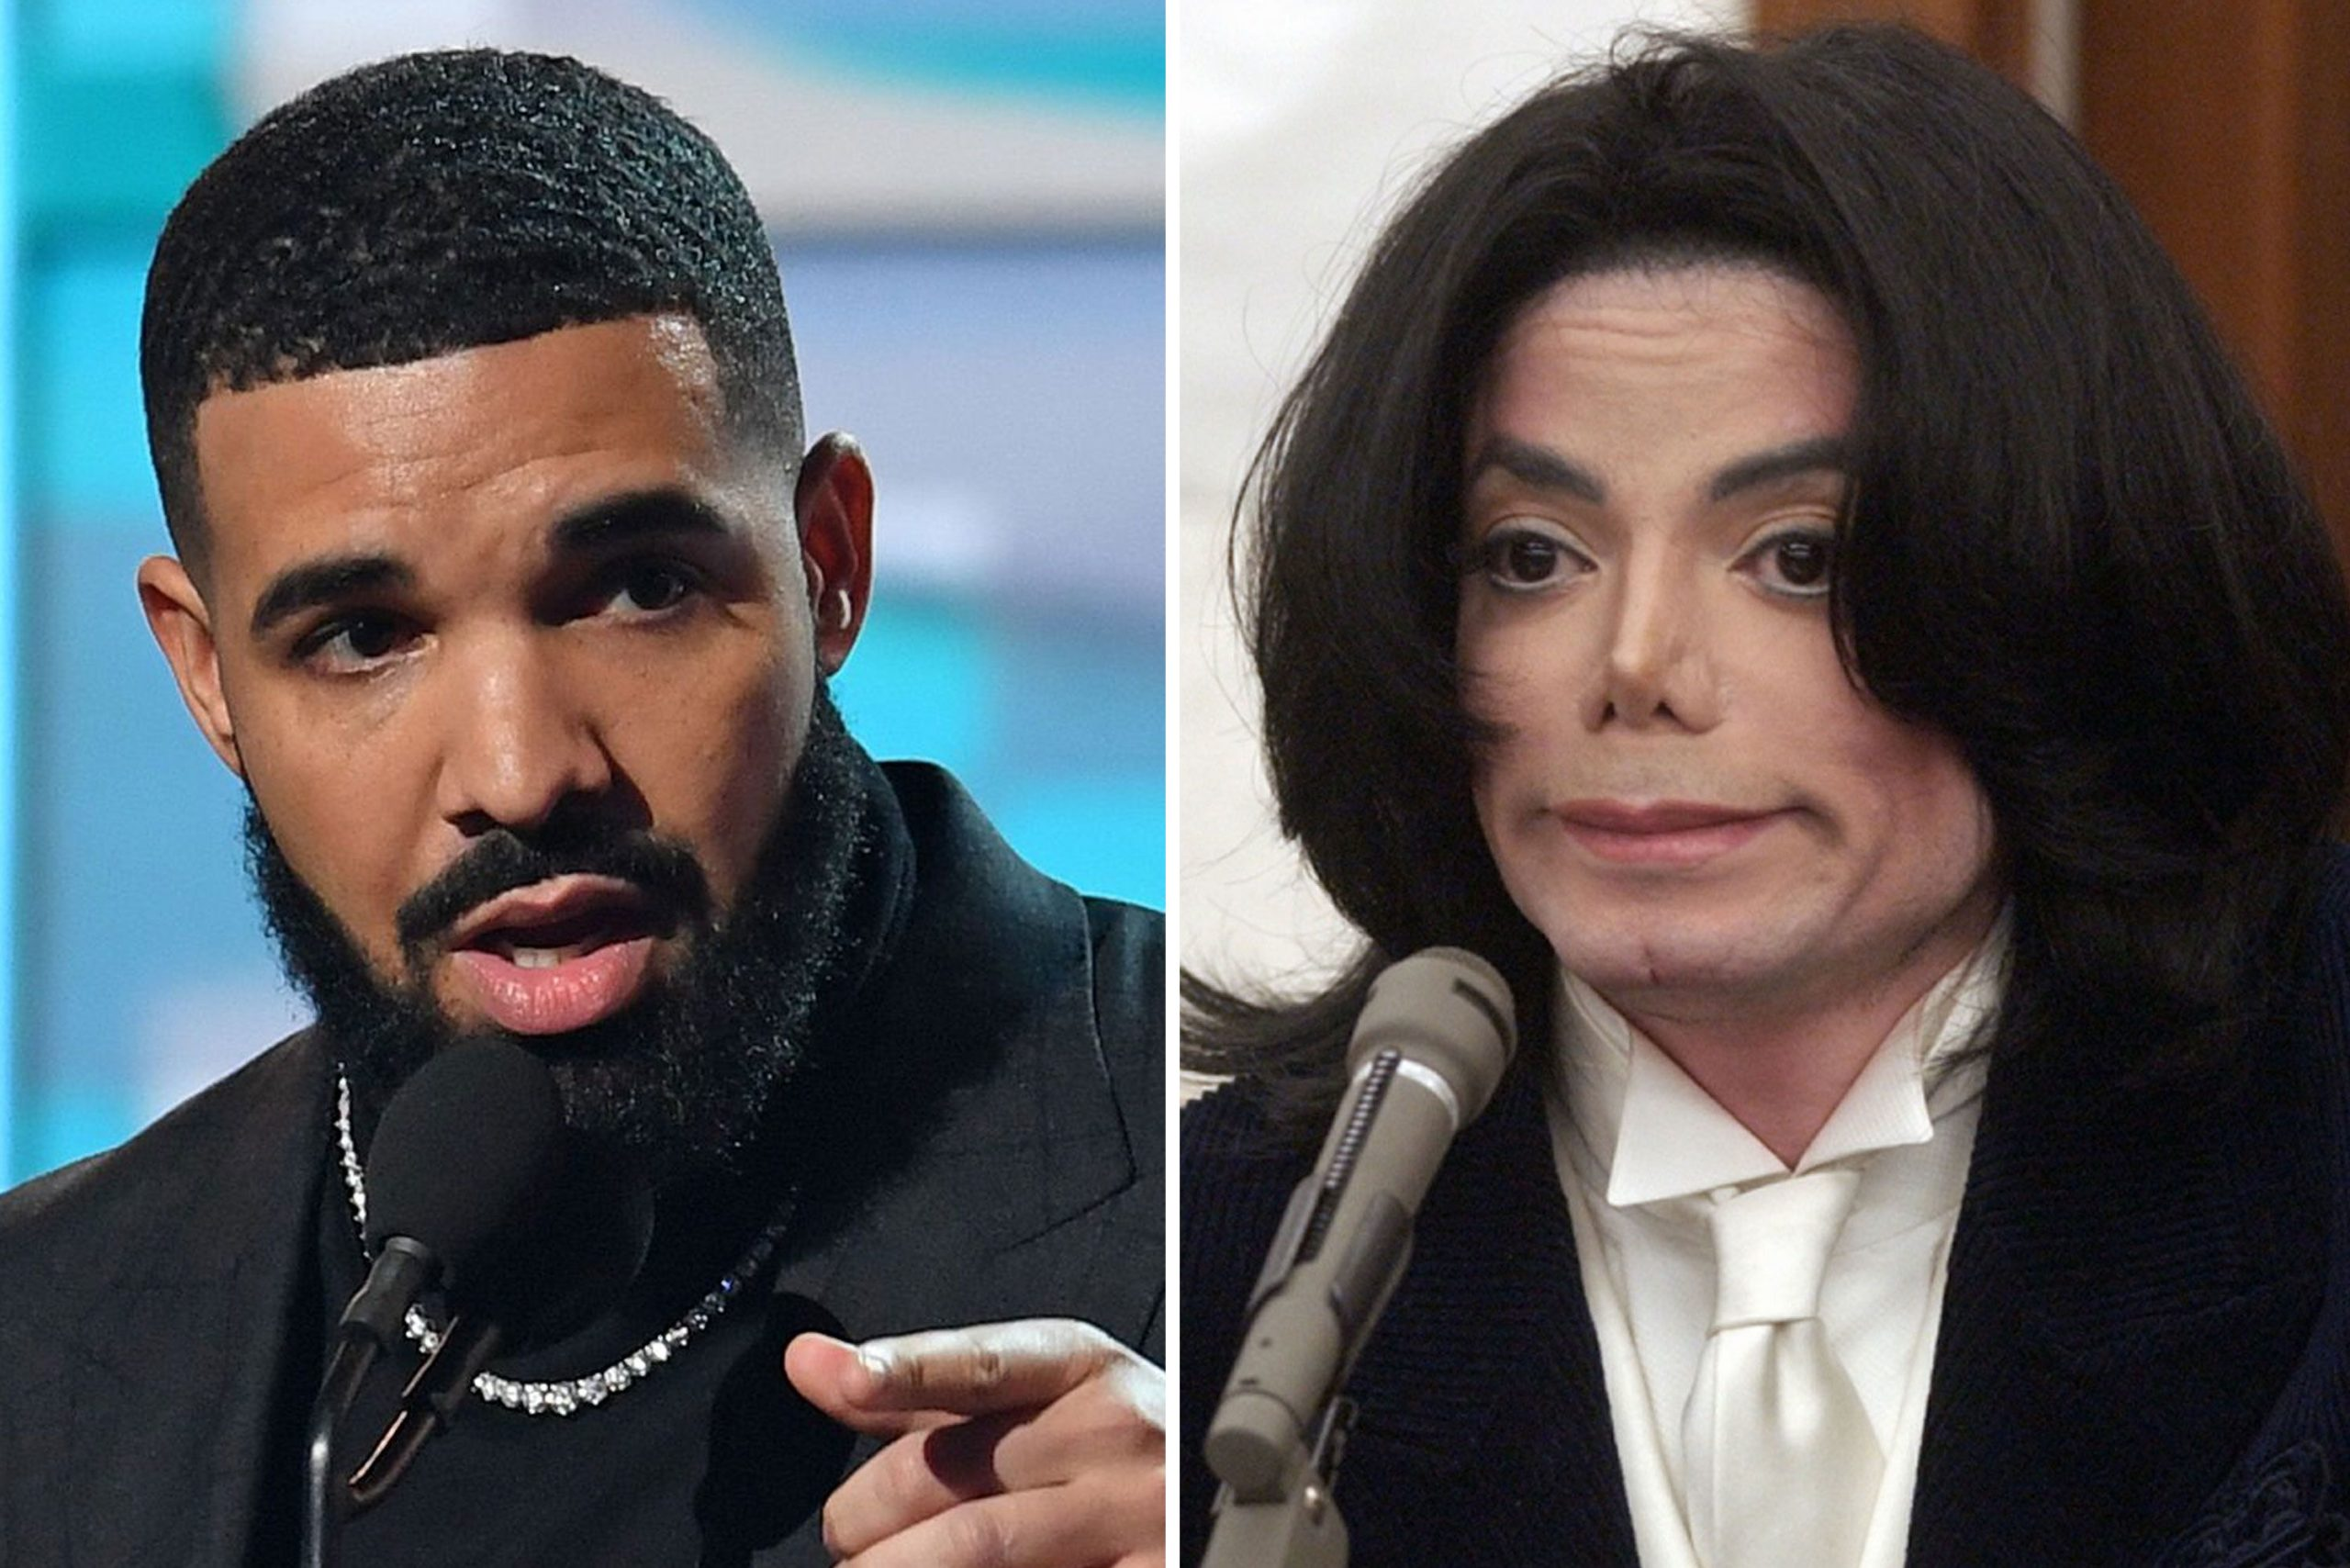 Drake Vs Michael Jackson The Legend Fans Debate Who Is Better!